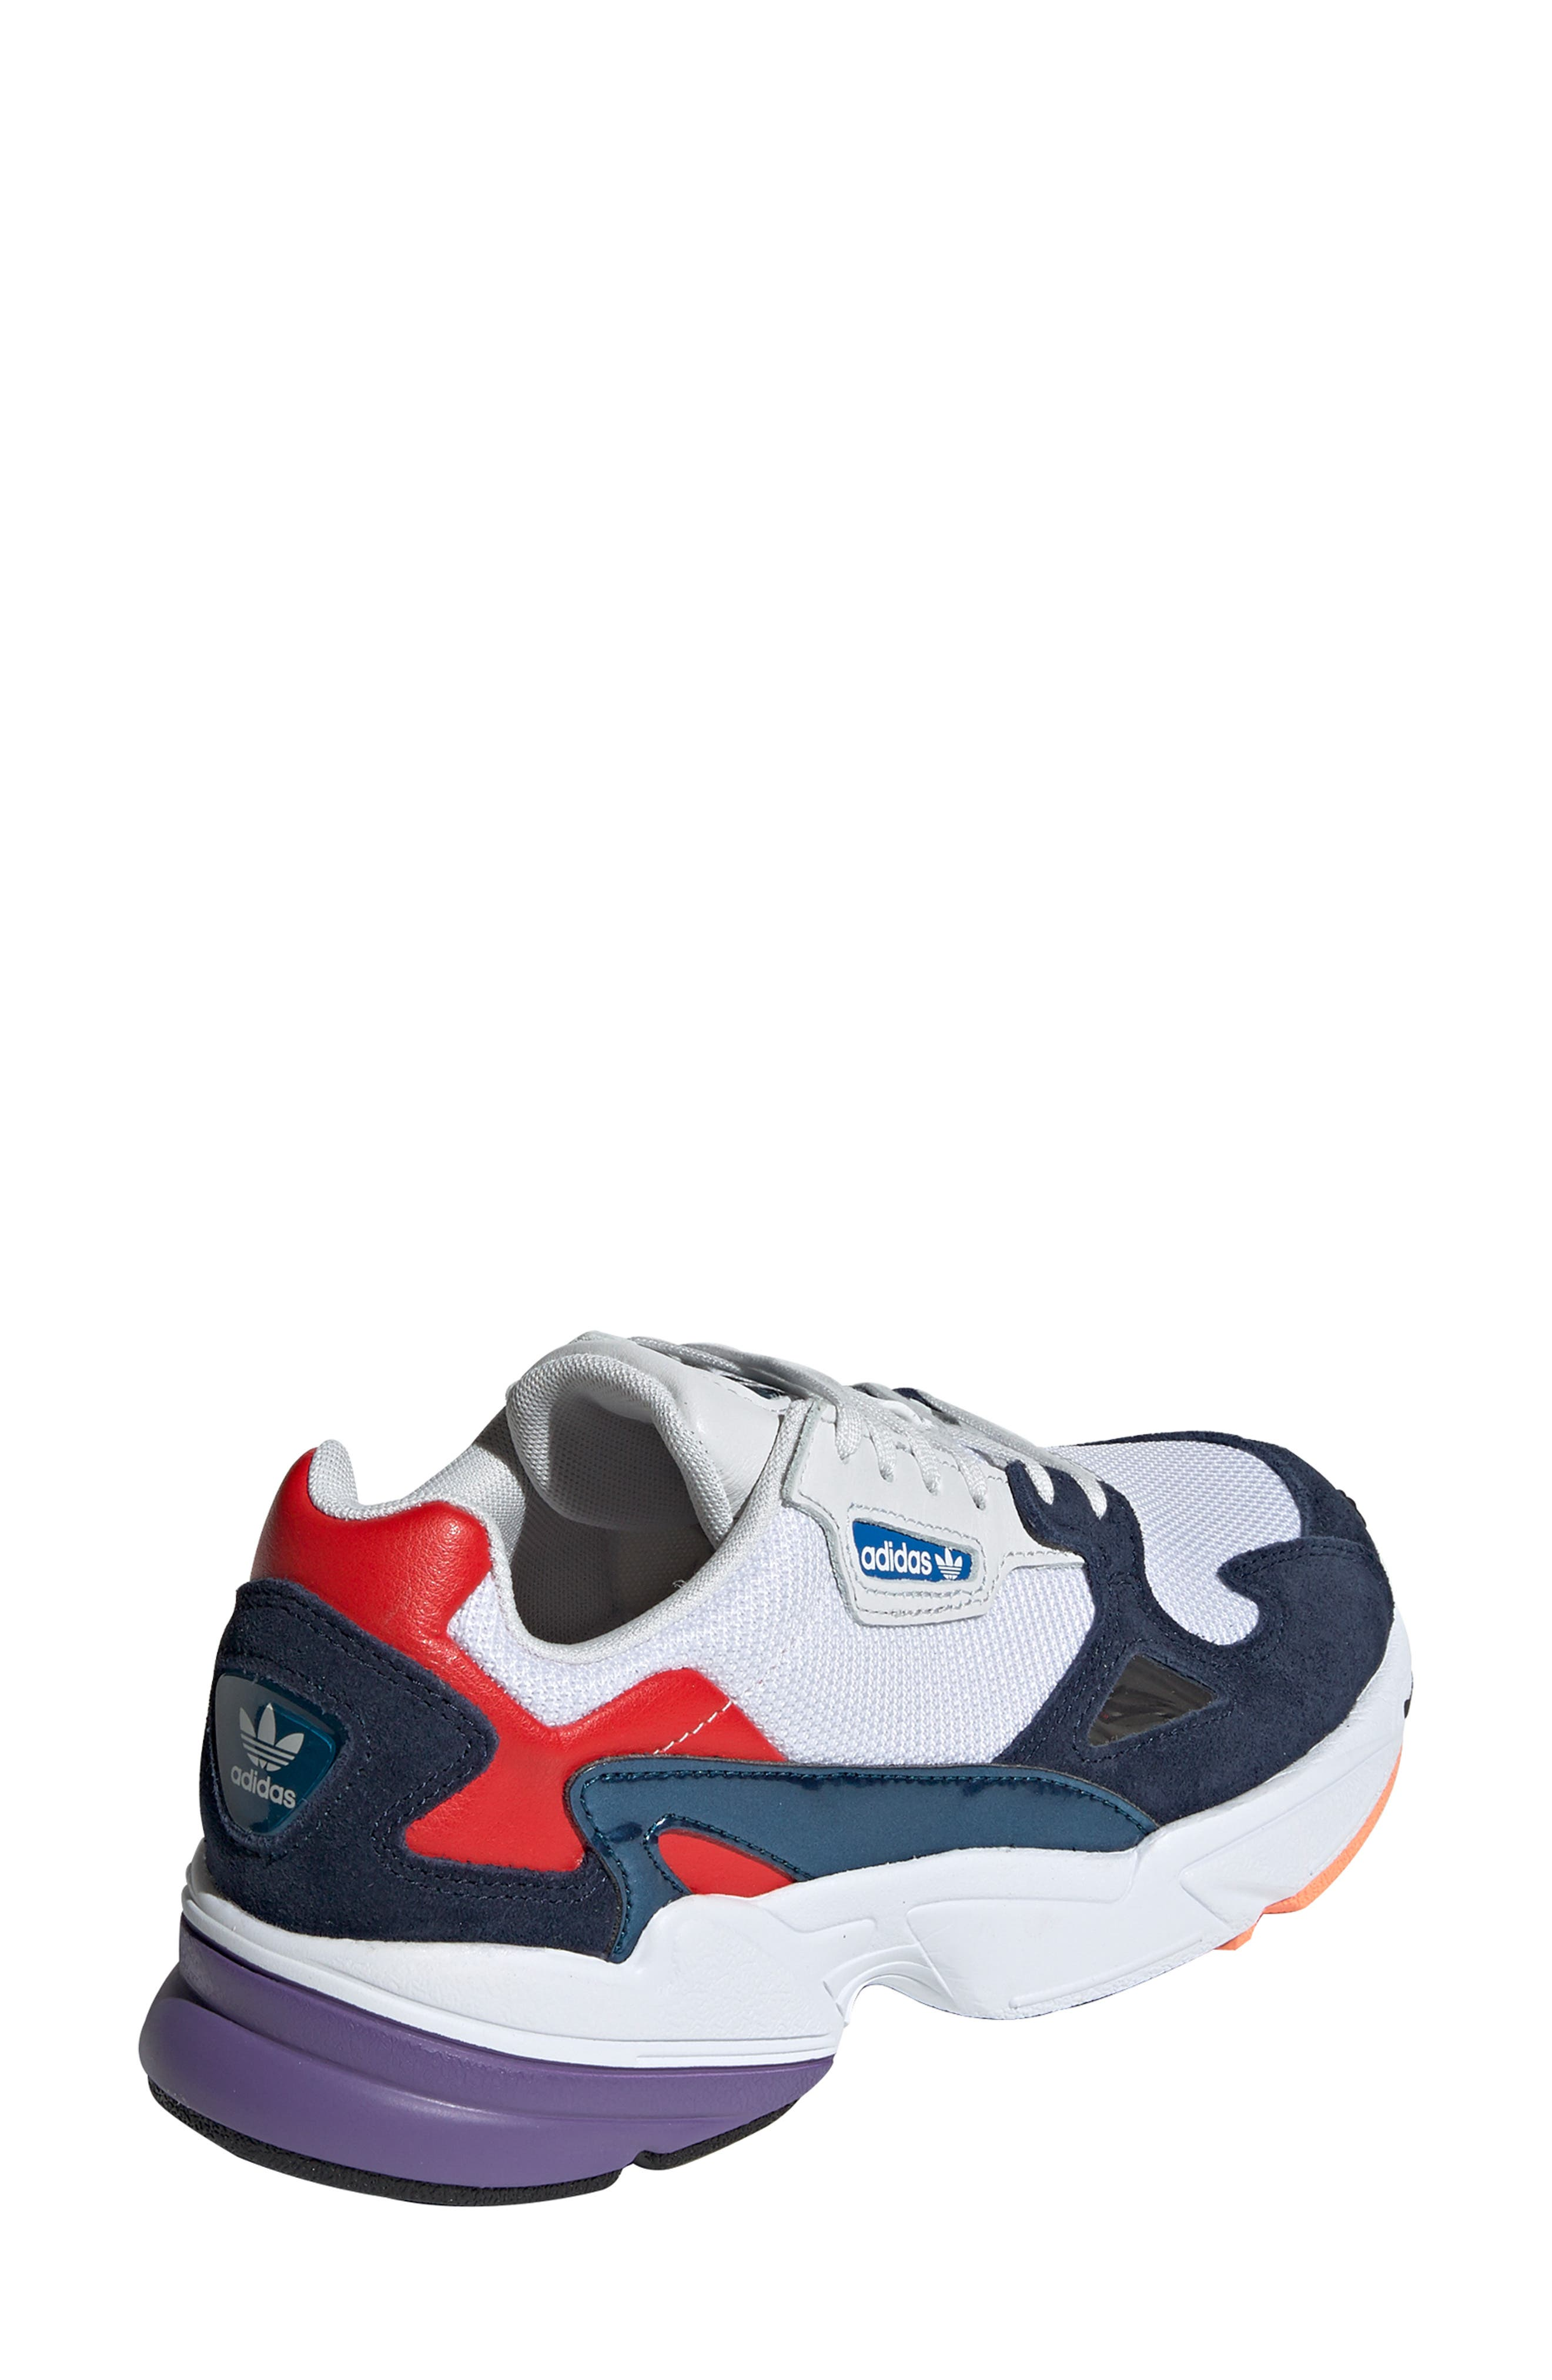 022933d1b Women s Adidas Sale